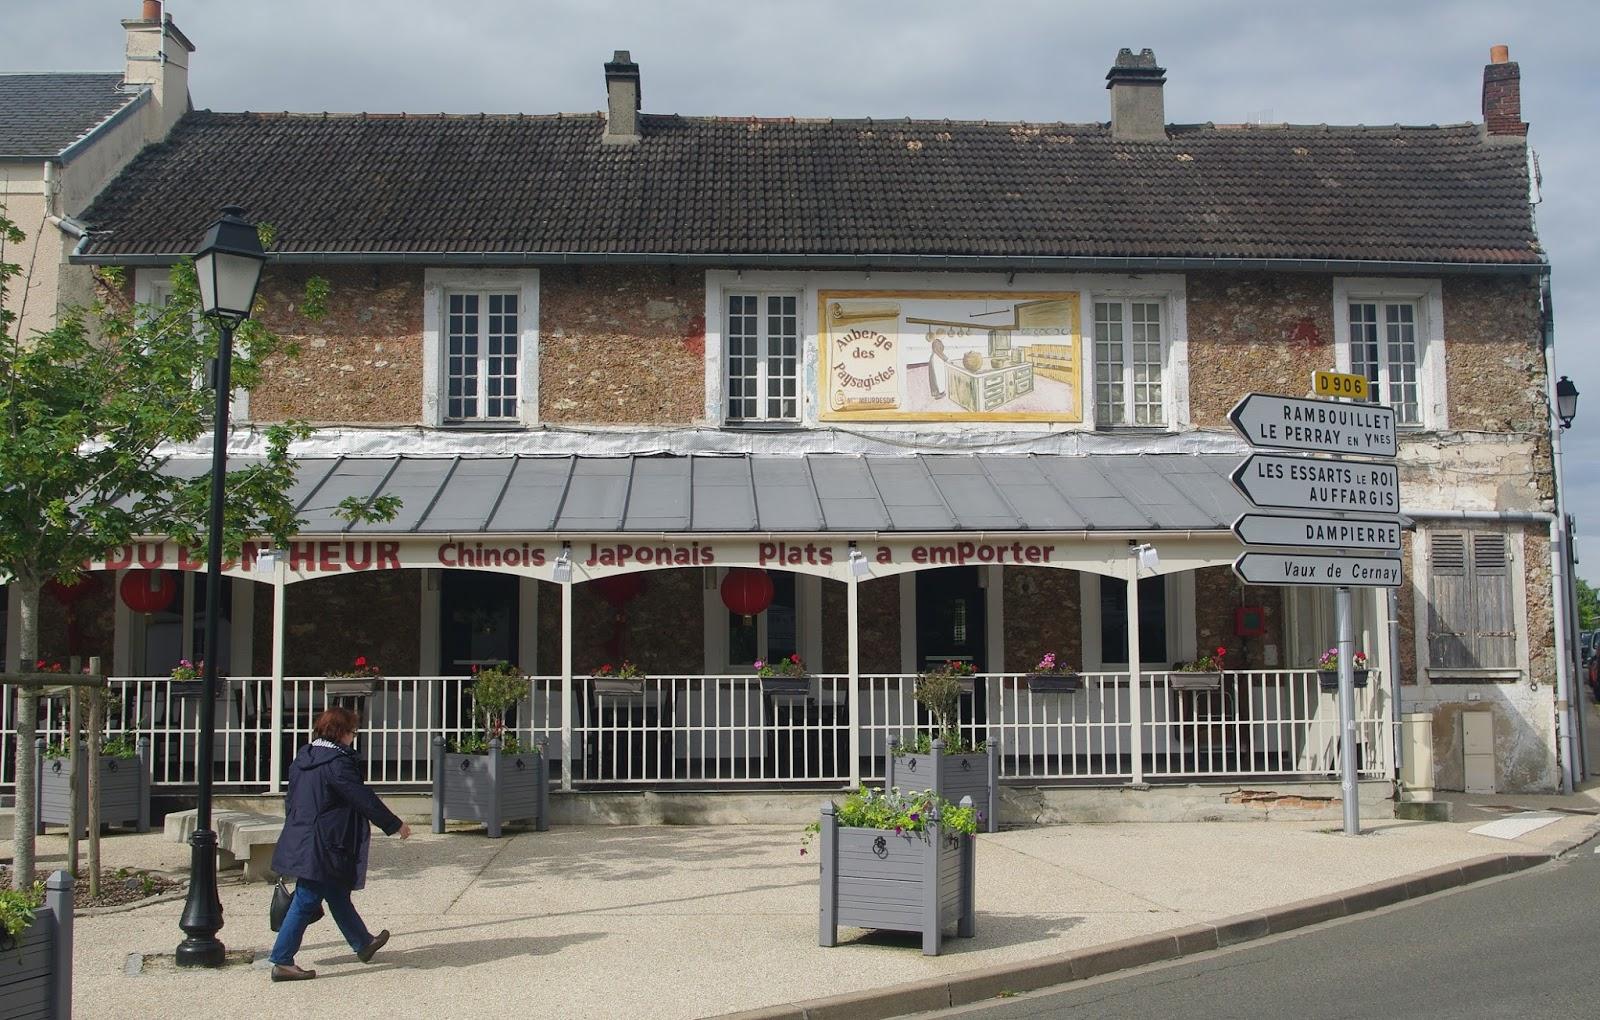 Restaurant Chinois Cernay La Ville